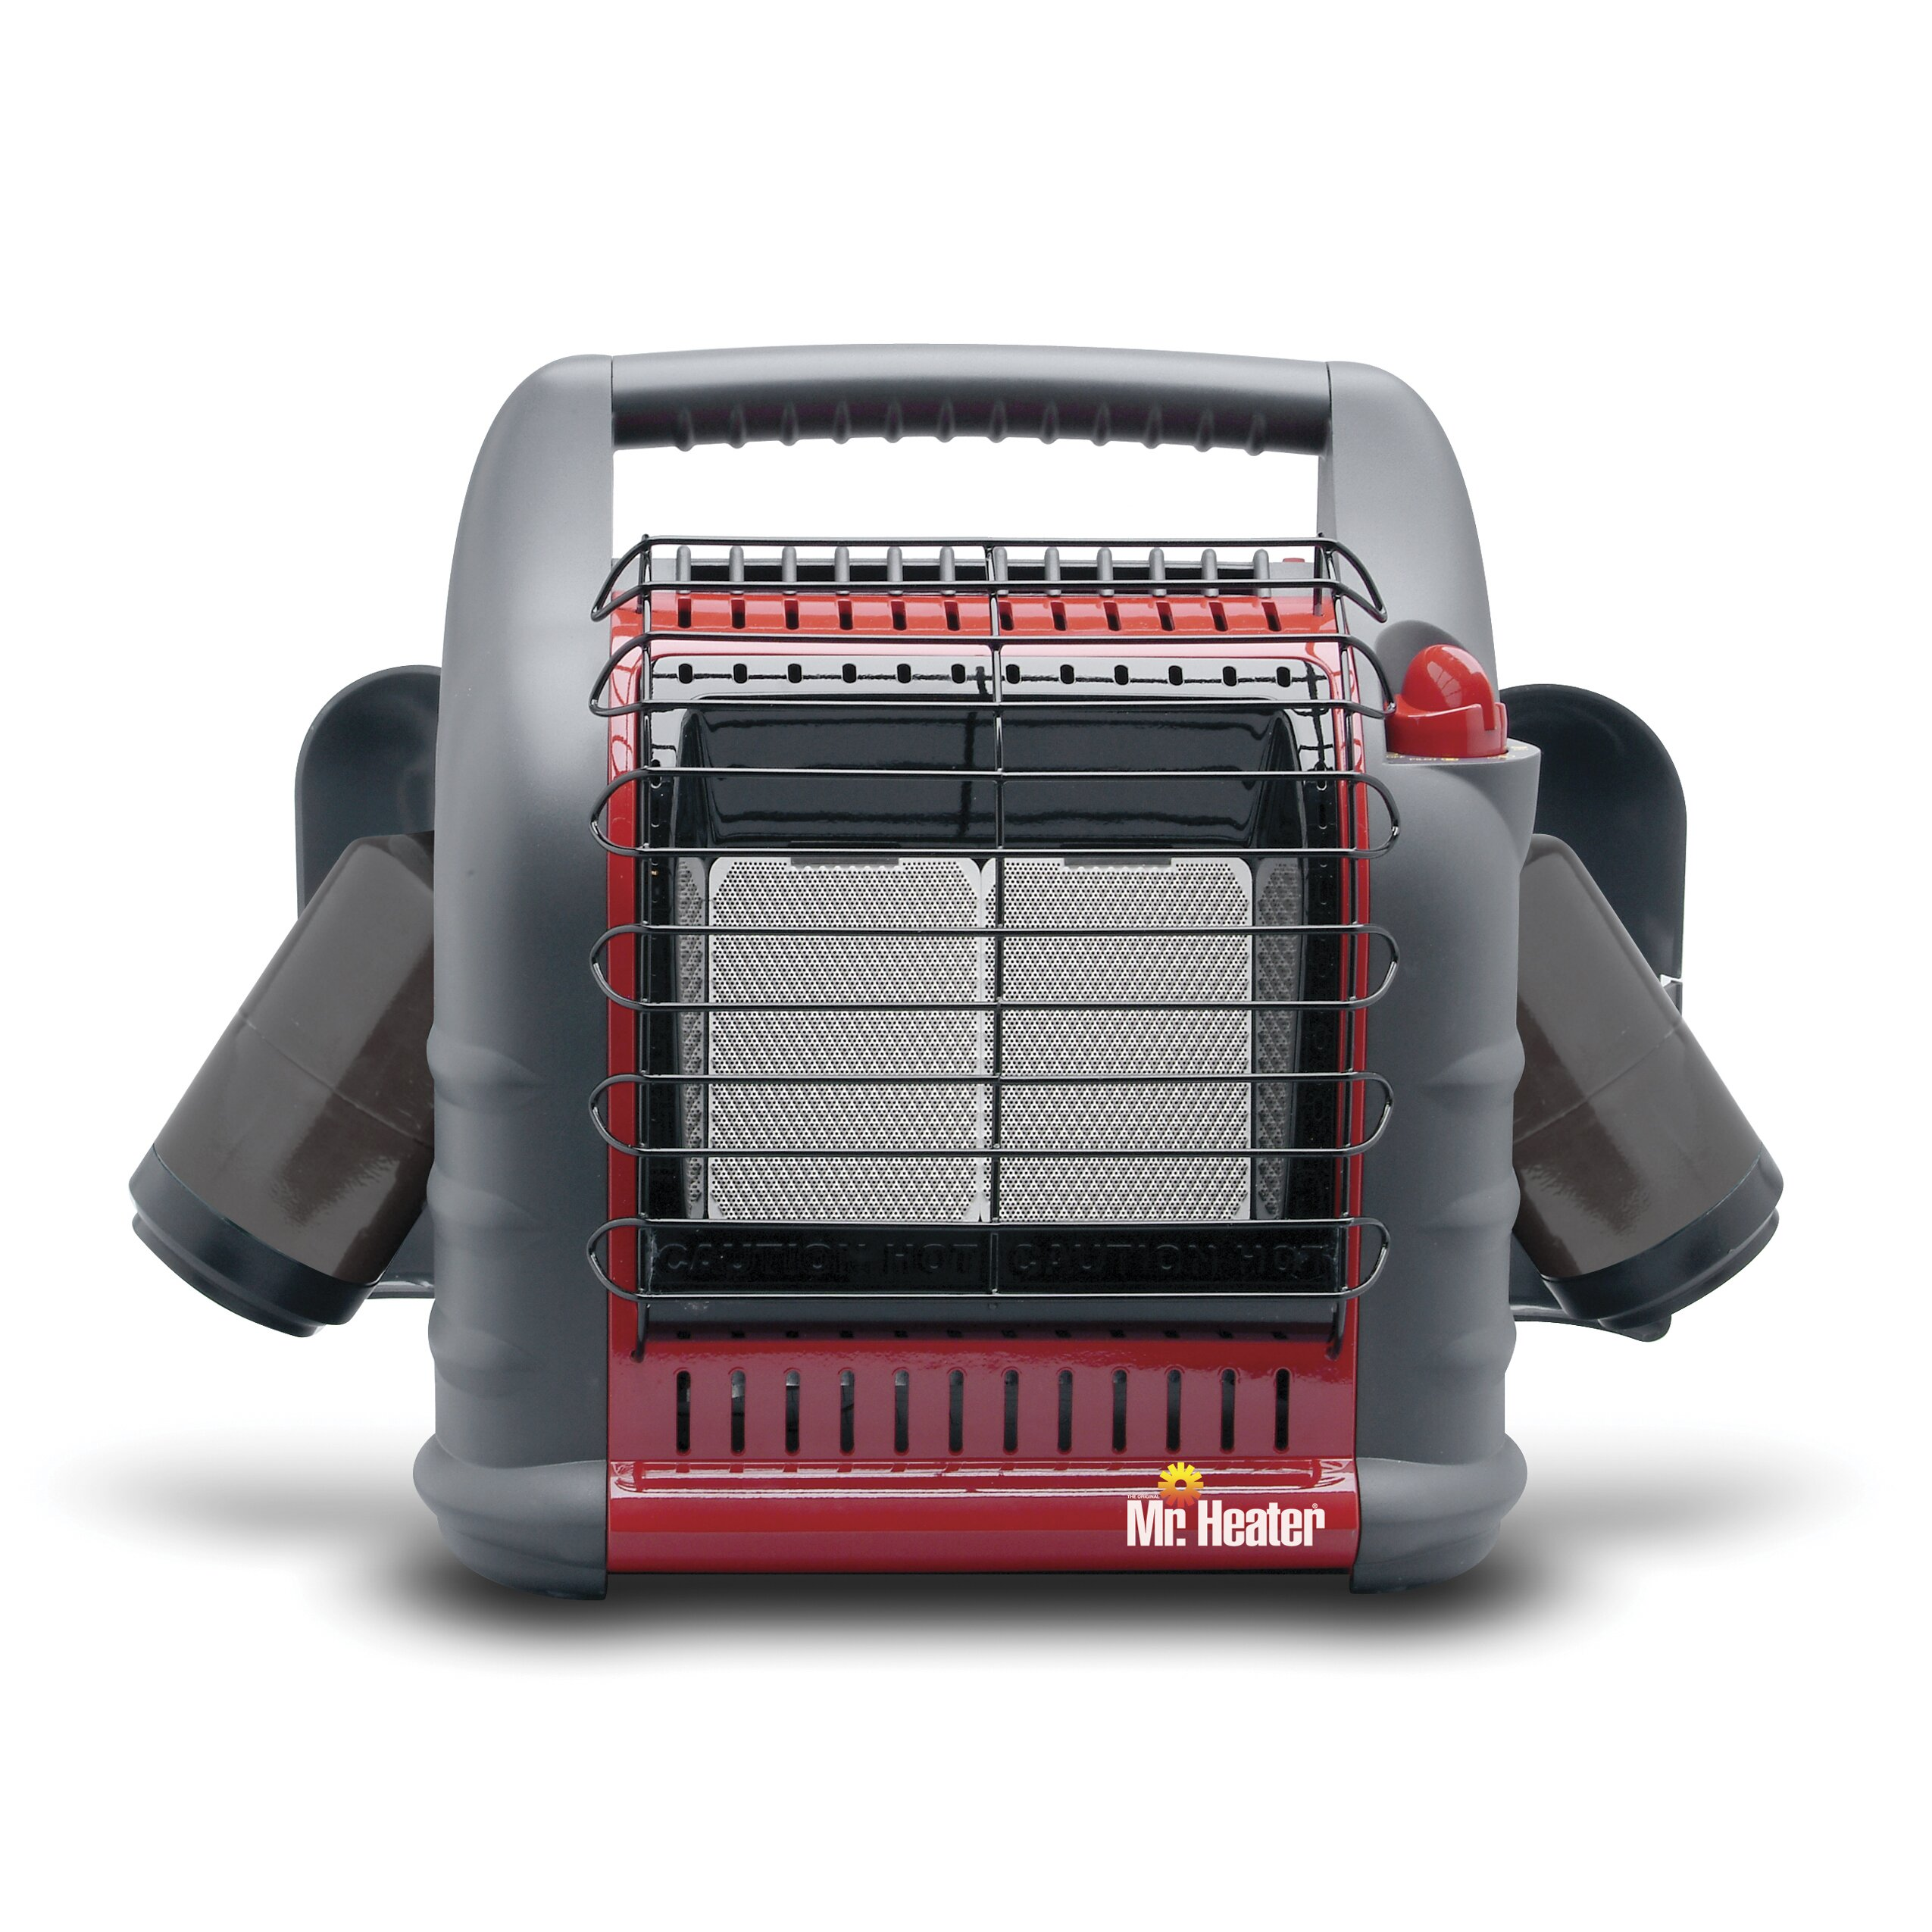 Mr. Heater Buddy Heaters 18,000 BTU Portable Propane ...